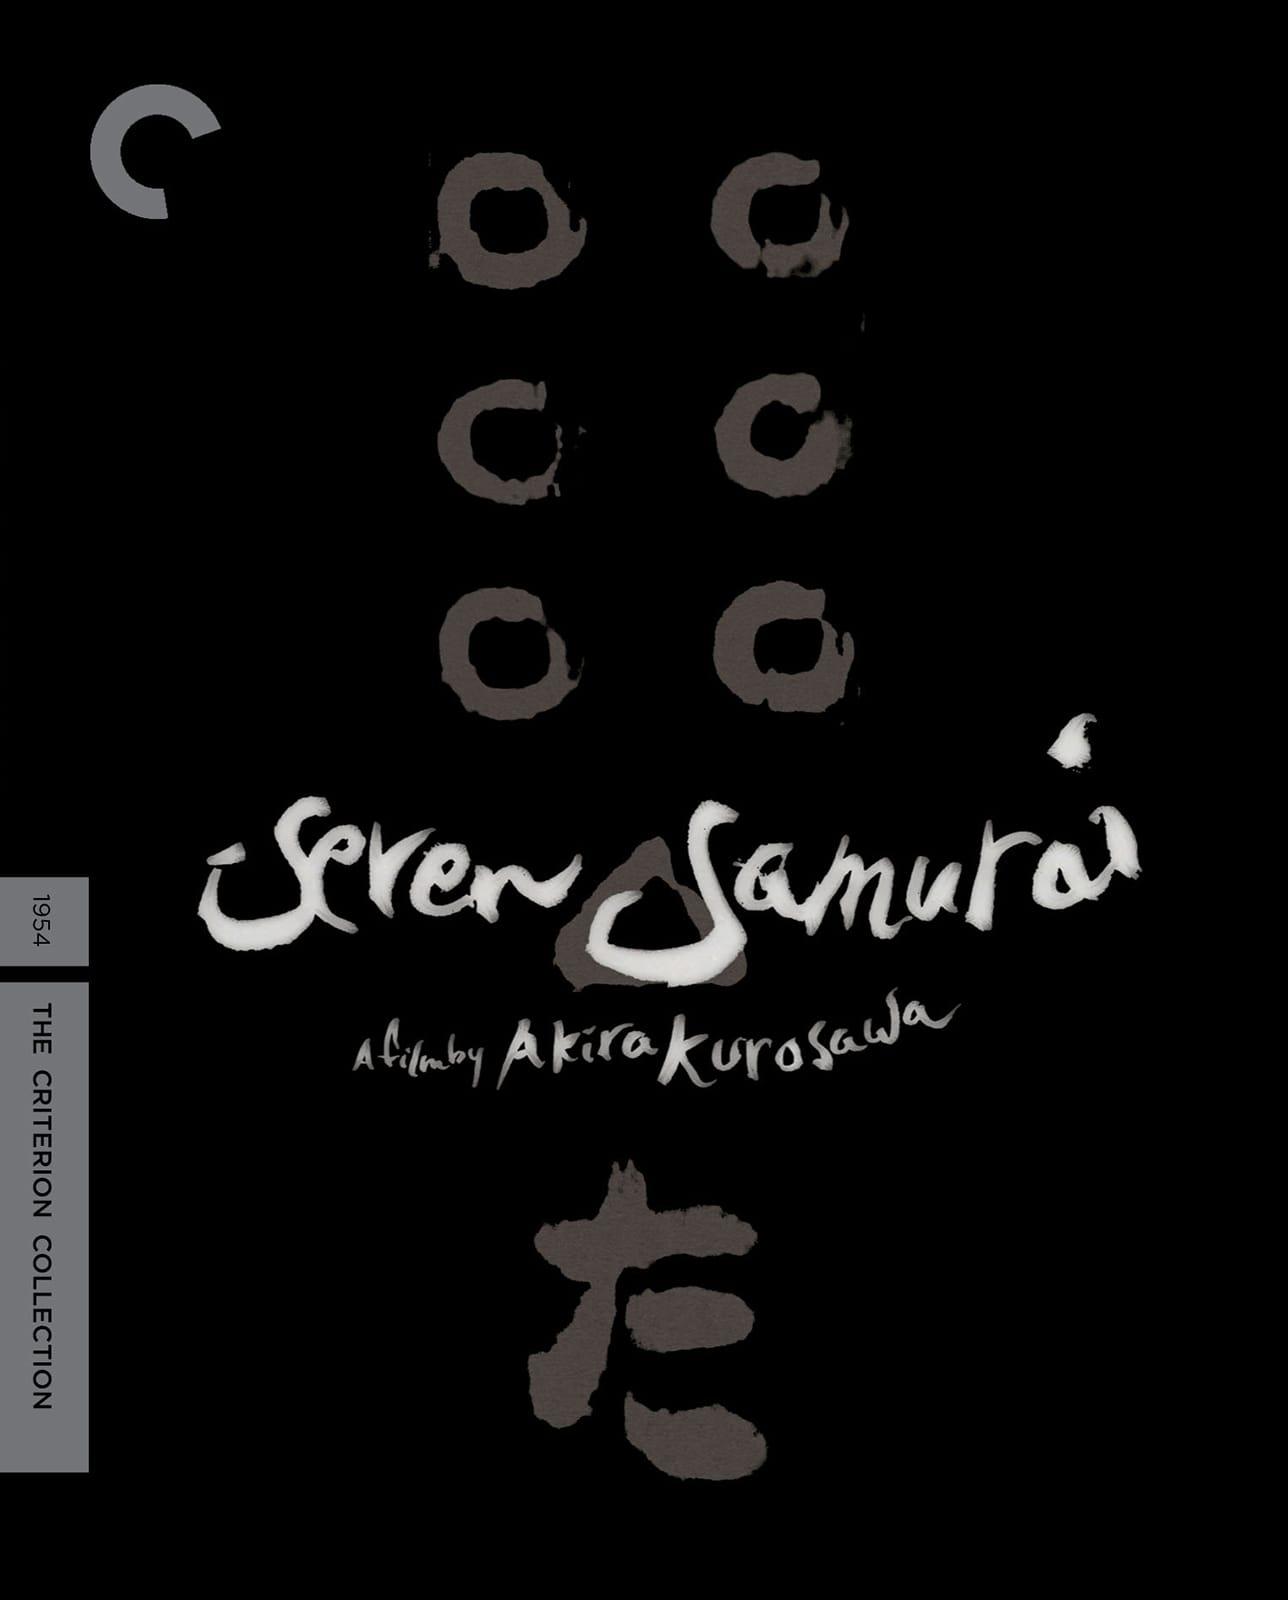 Seven Samurai